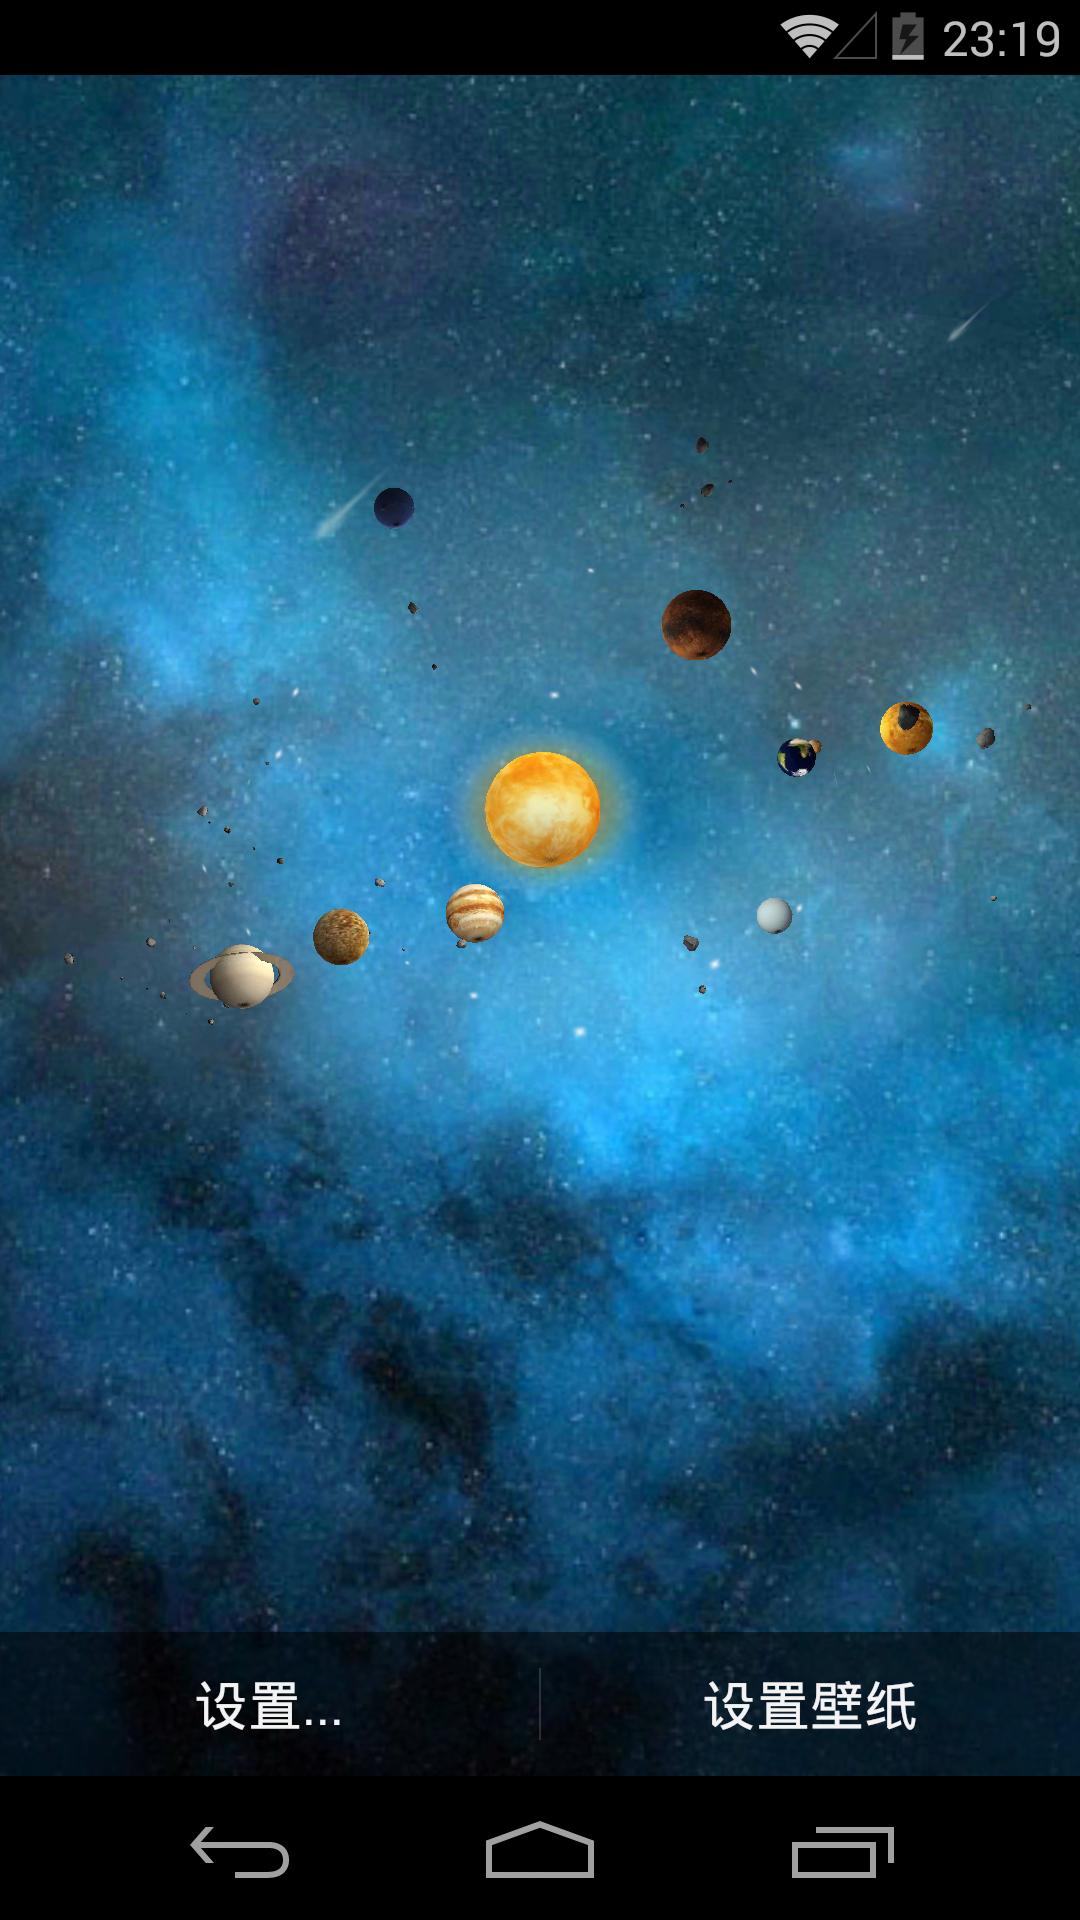 3D太空之眼-梦象动态壁纸